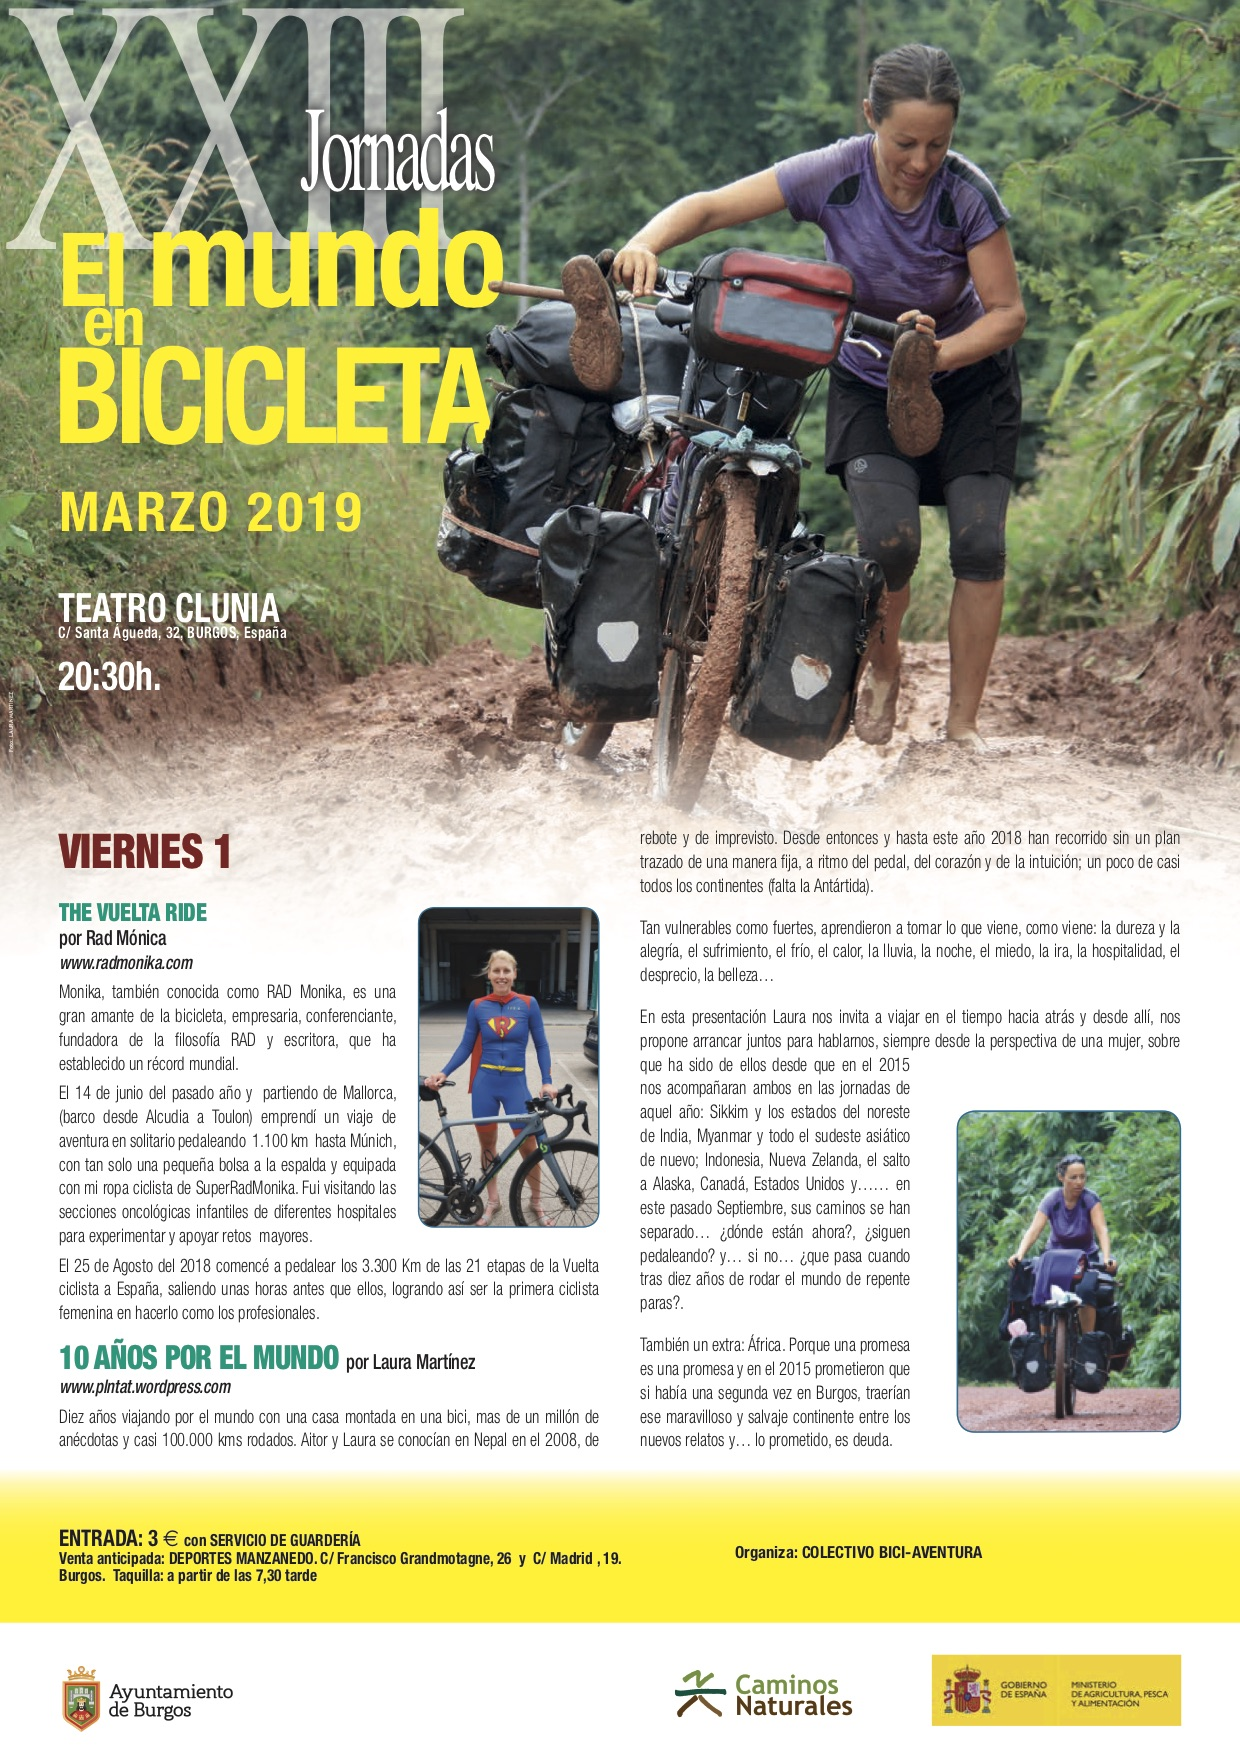 TRÍPTICO  XXIII Jornadas El mundo en bicicleta